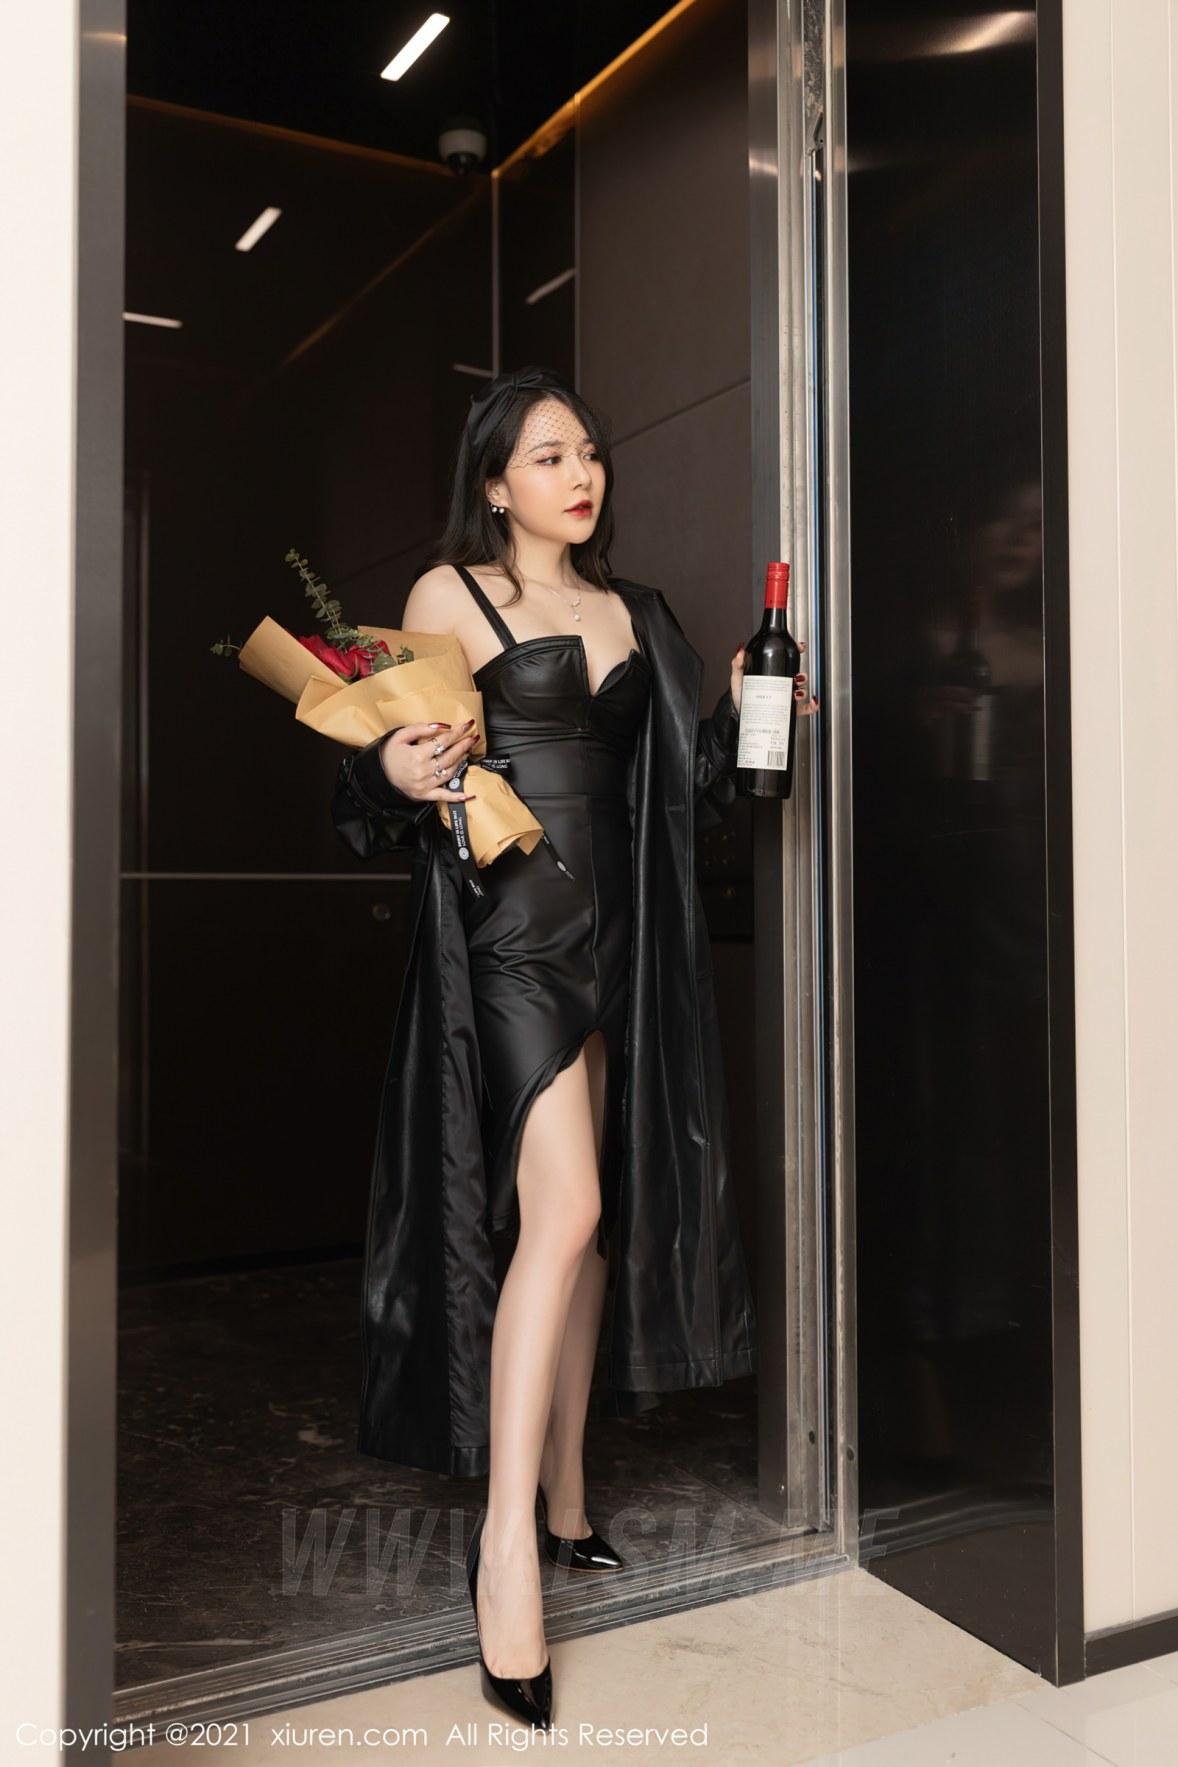 XiuRen 秀人 No.4021 妻子们的聚会主题 鱼子酱Fish 性感写真11 - 4